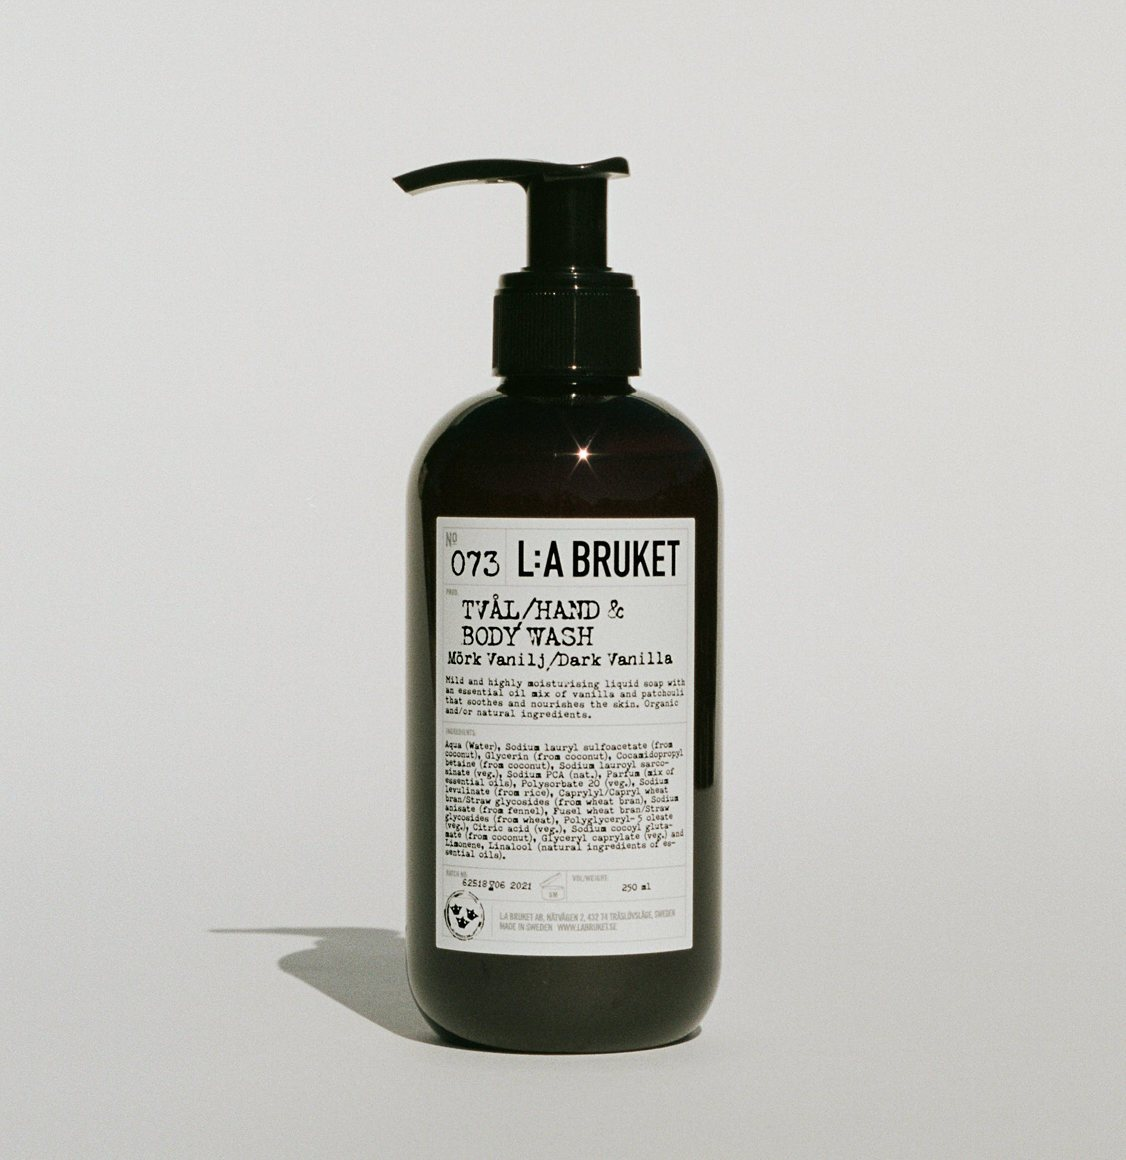 LA Bruket 073 Hand and Body Wash Dark Vanilla 250ml